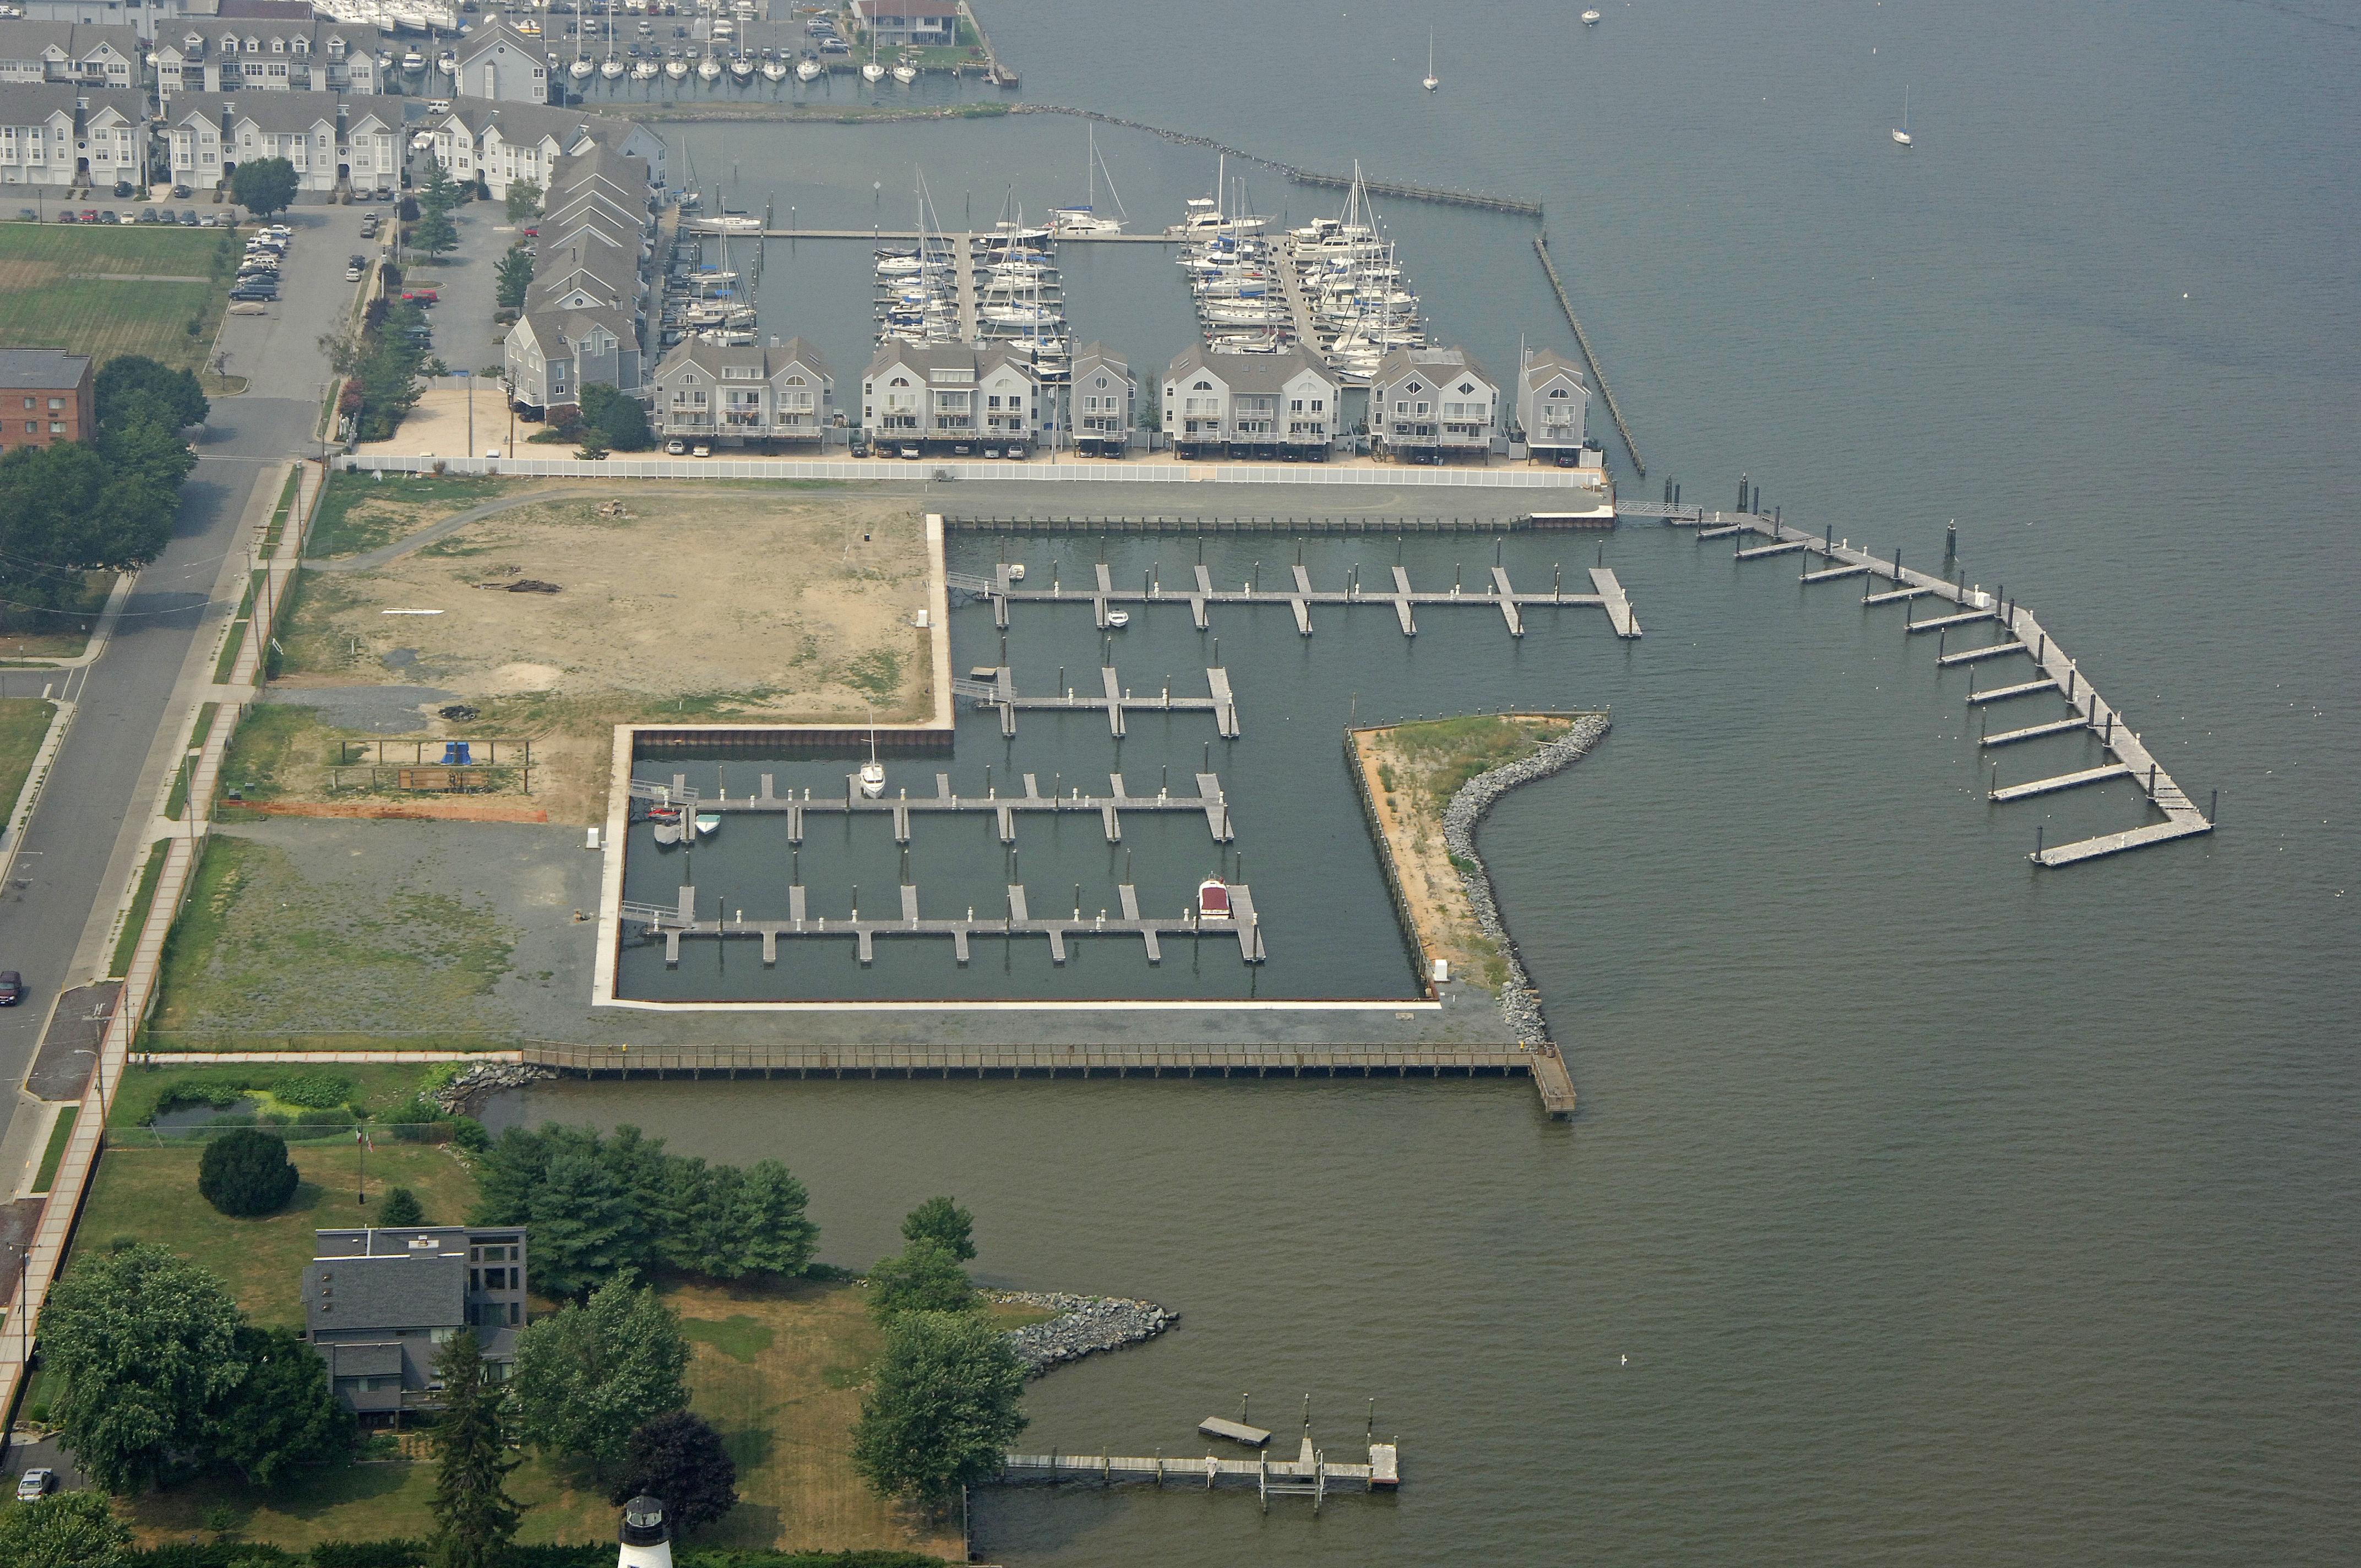 Penns Beach Marina at Heron Harbor in Havre De Grace, MD